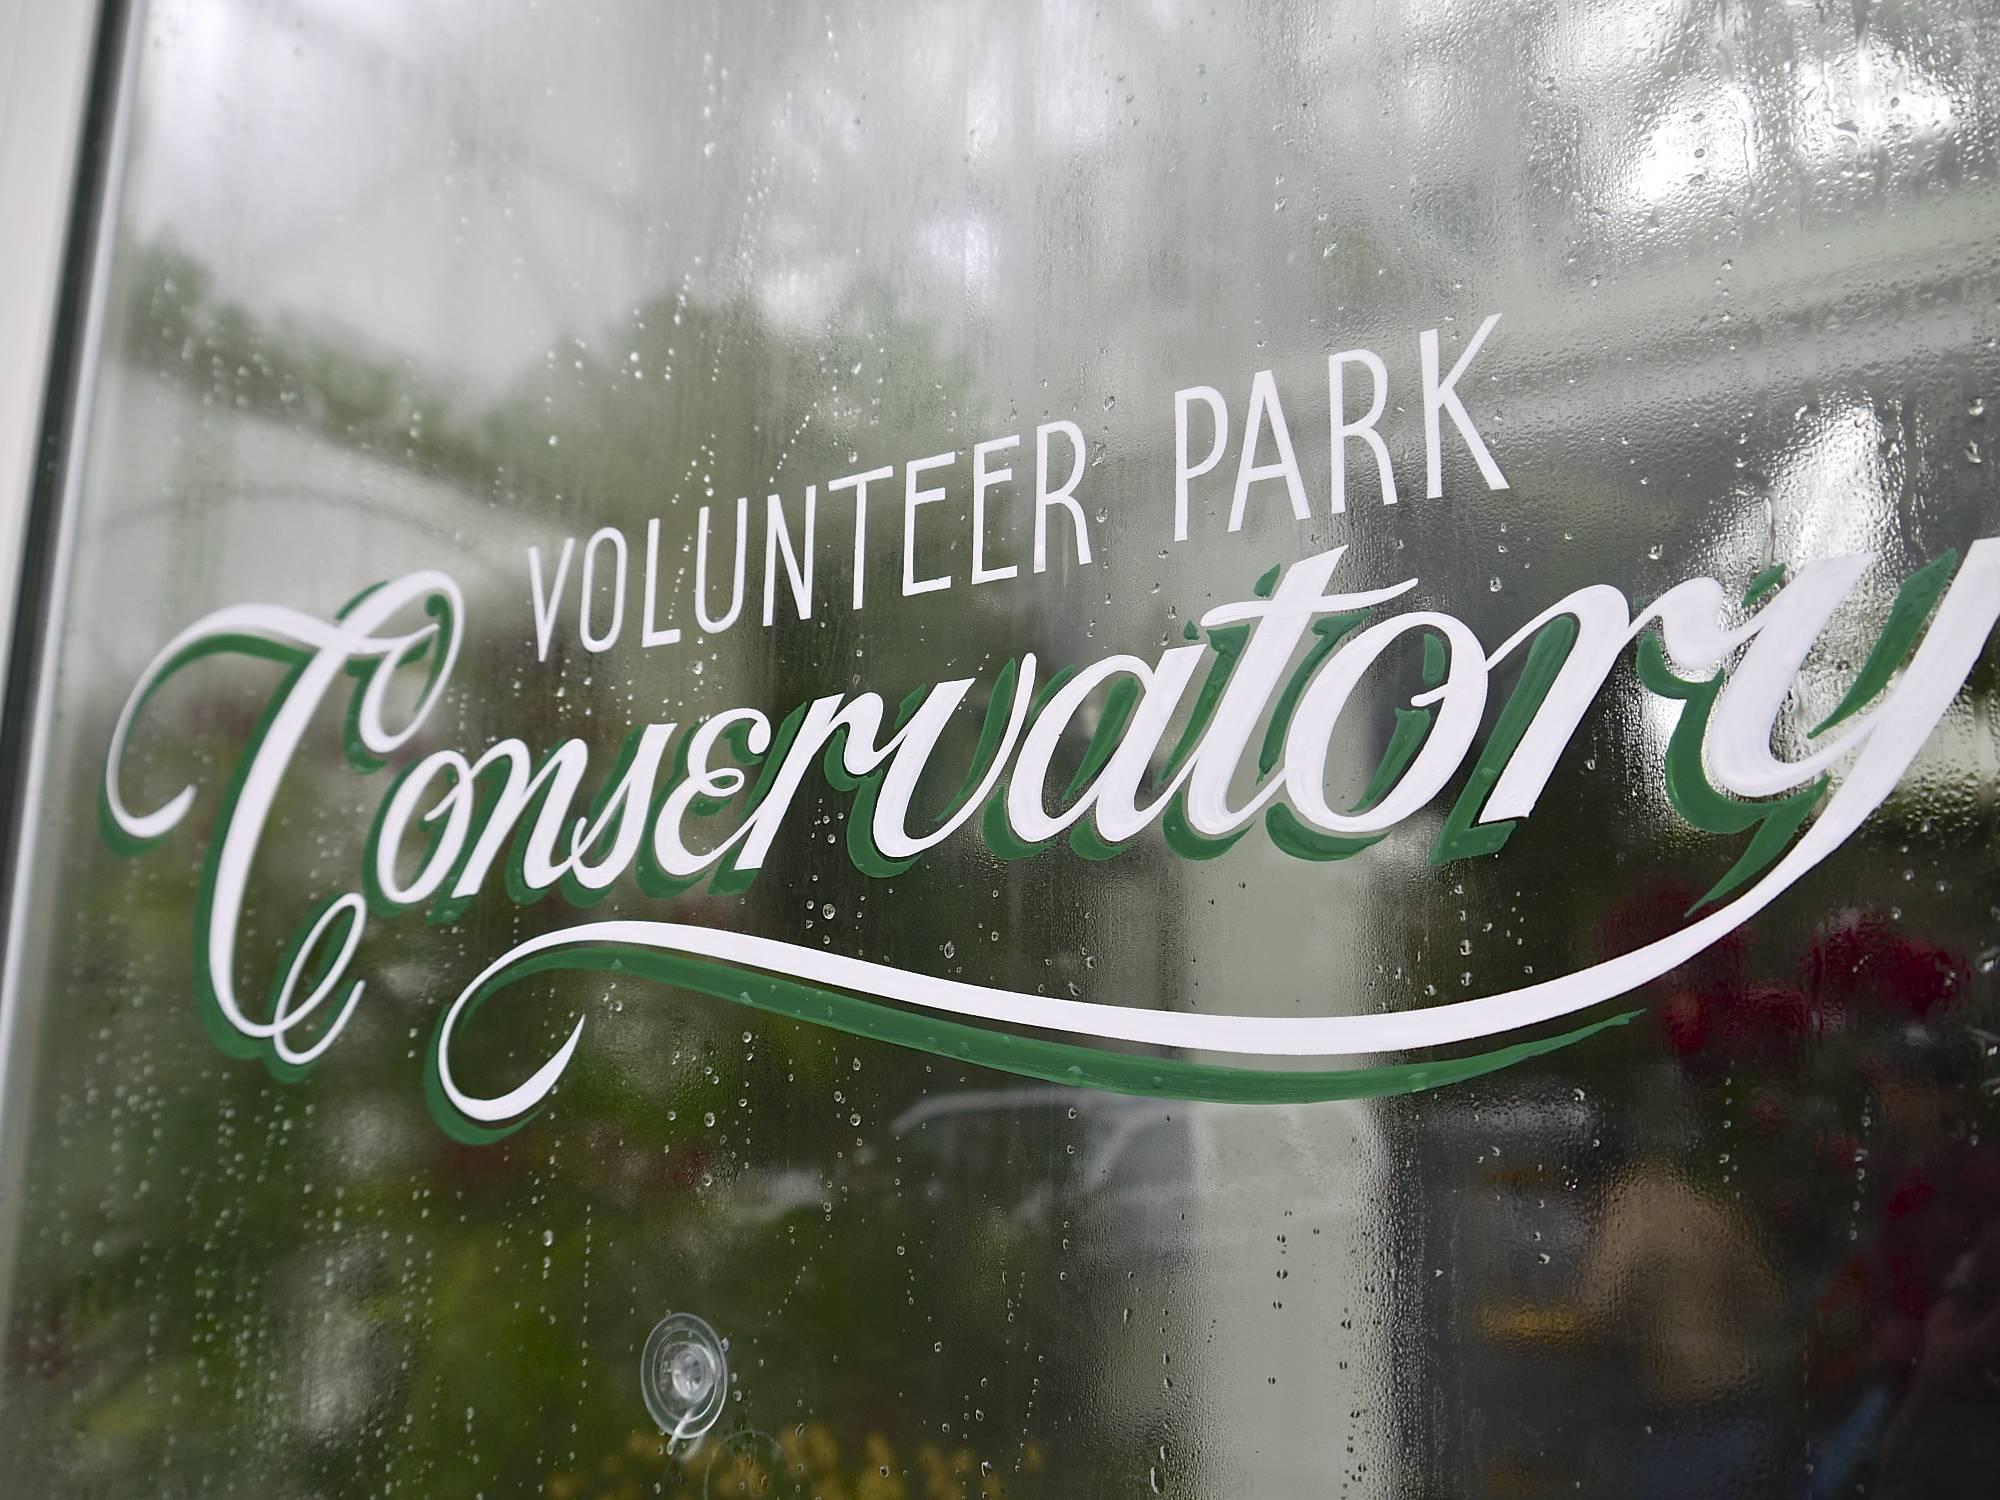 Volunteer Park Conservatory